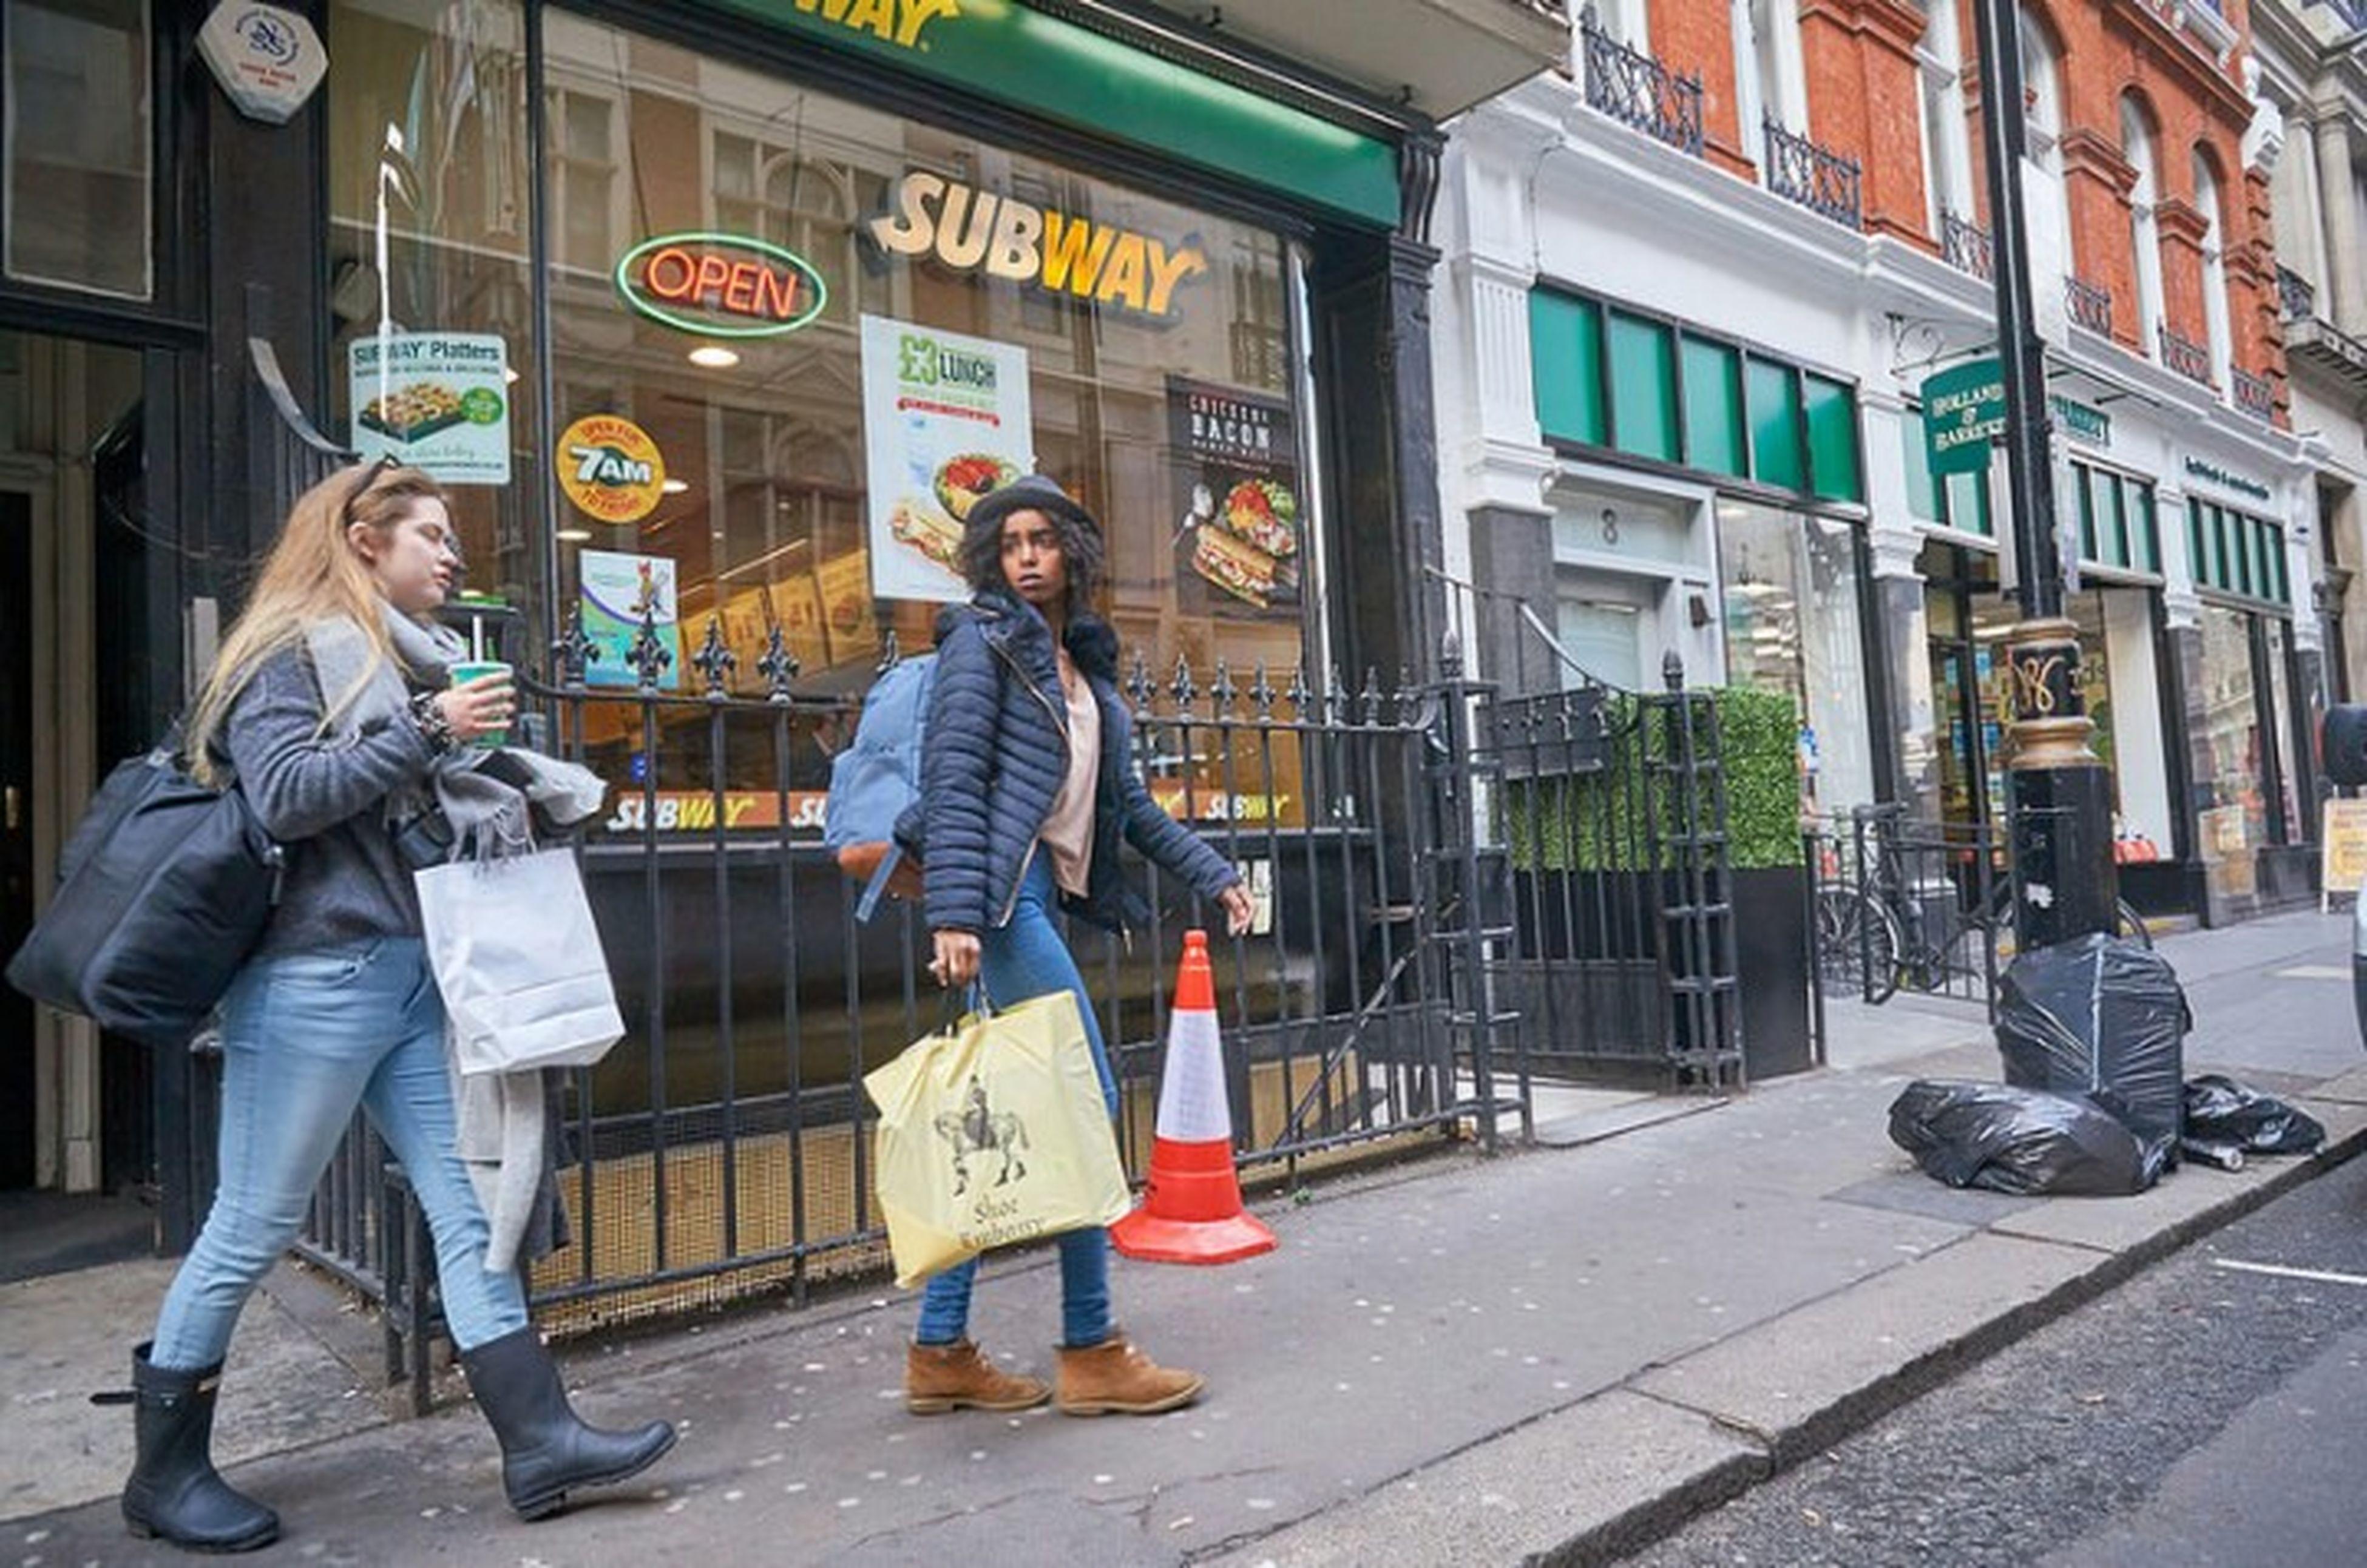 LONDON❤ London Streets Fitzrovialitter Londonstreets Streetphotography Street Photography Streetphoto Urban Londononly London London London!!! Girls Londonlife Jeans Streetlife Street Photo Girl